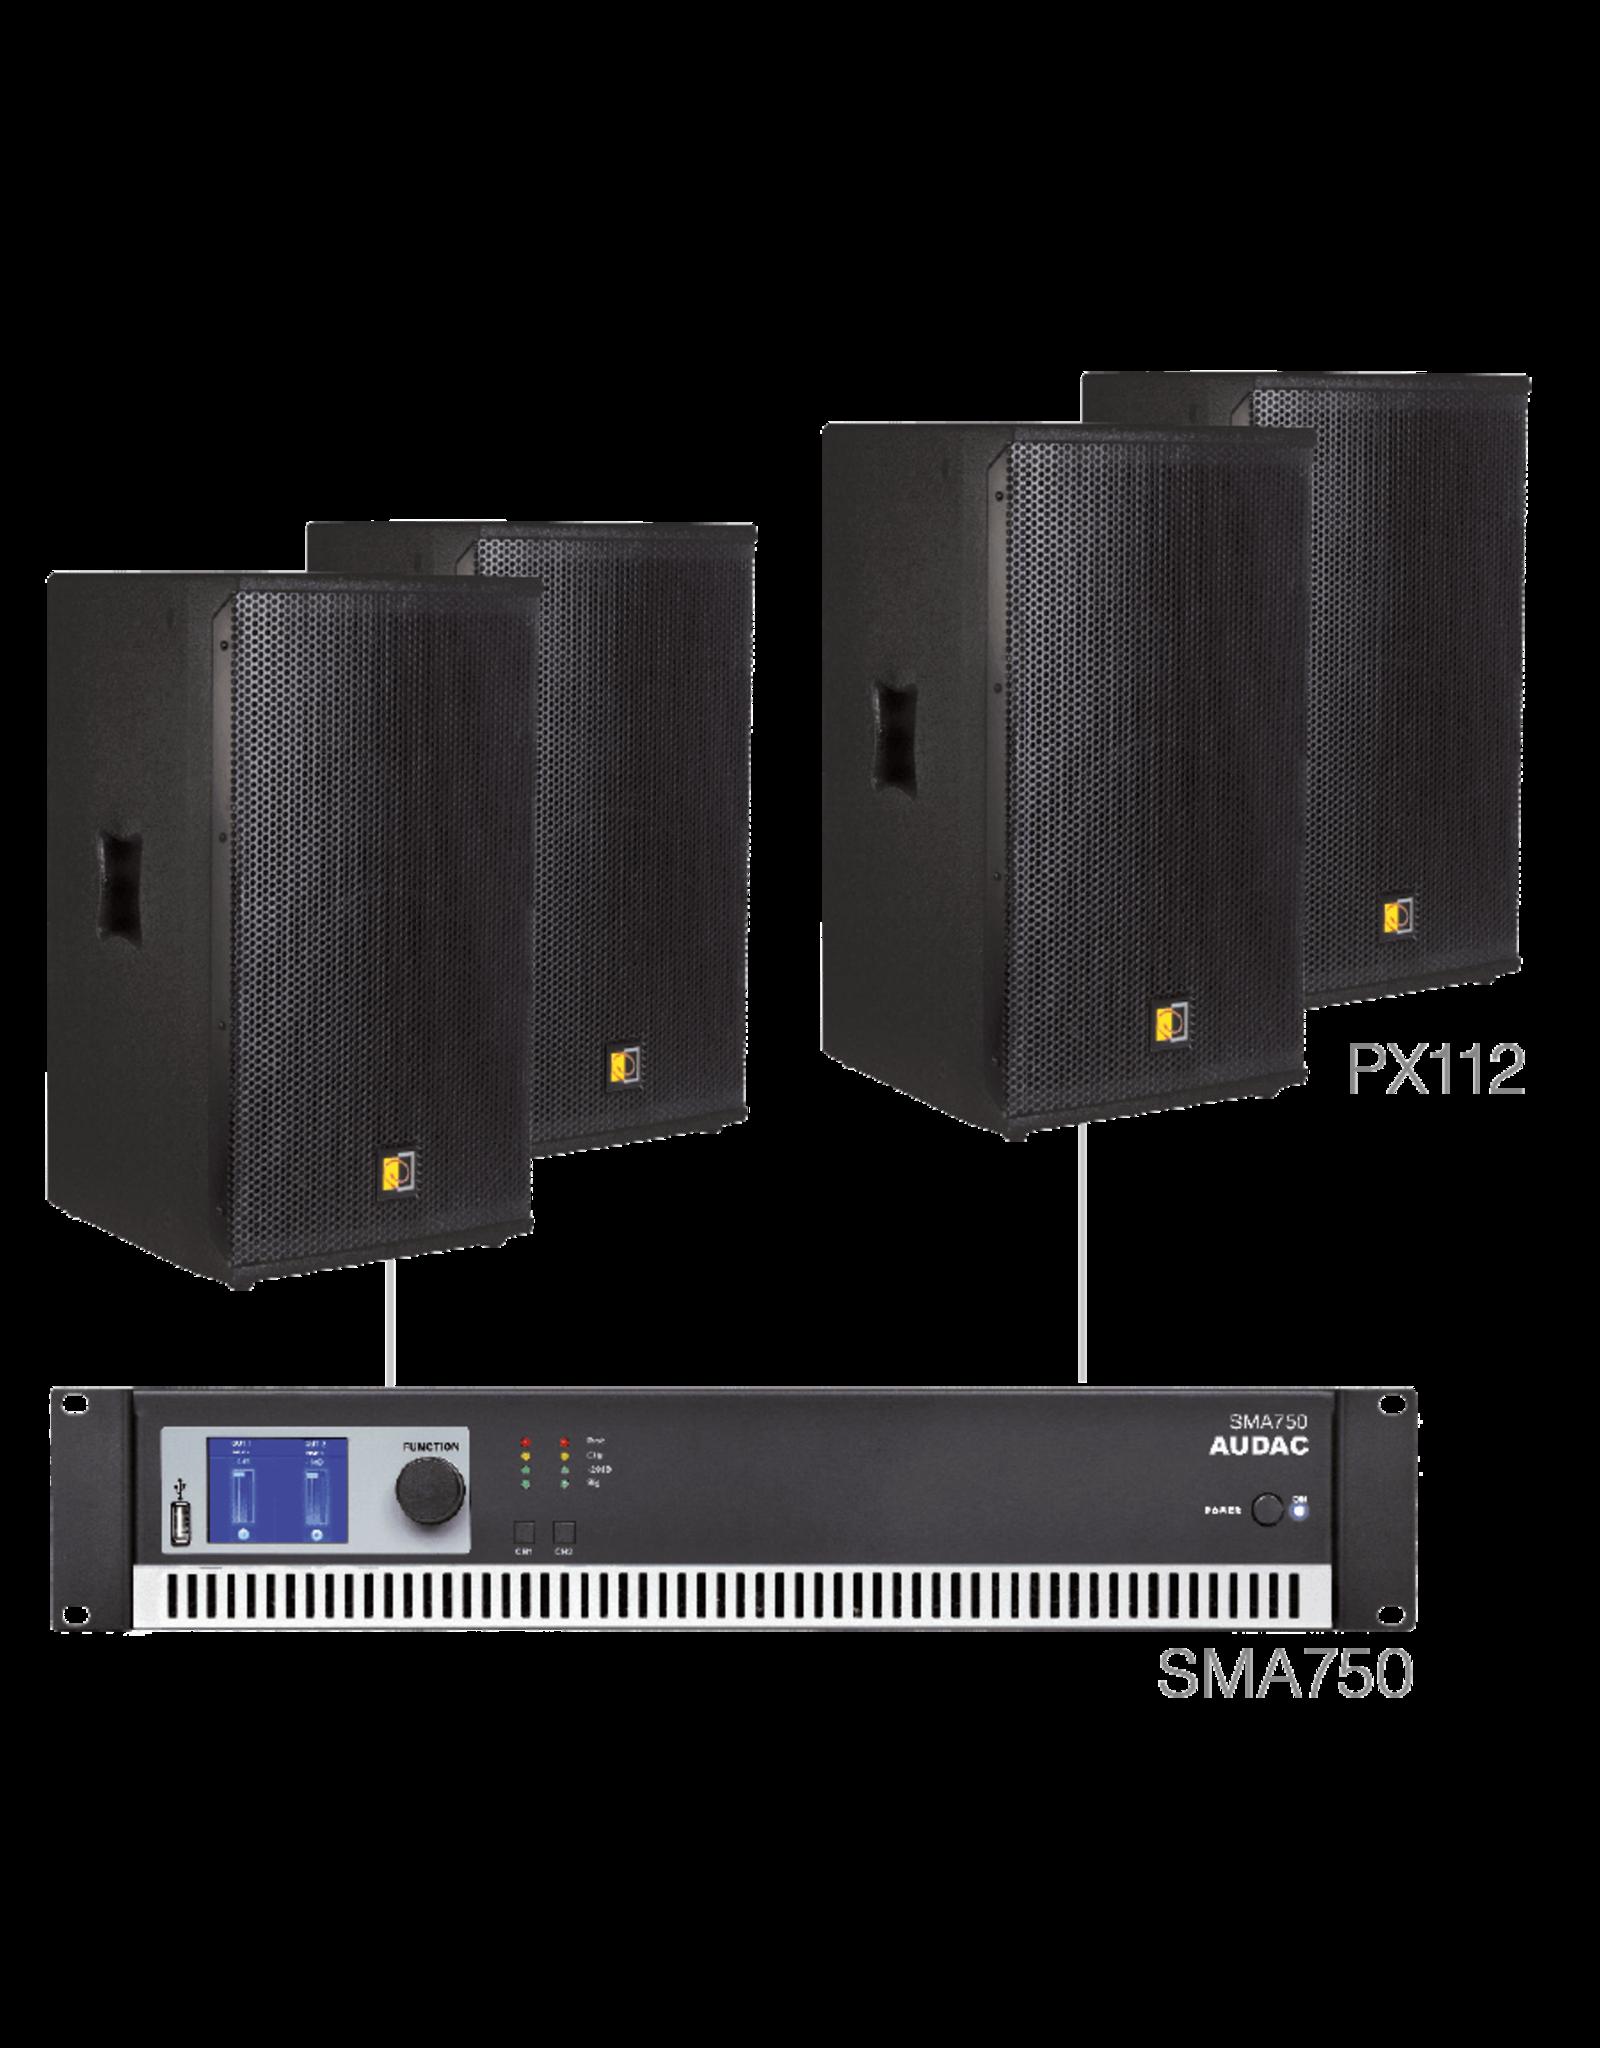 Audac 4 x PX112 + SMA750 Black version